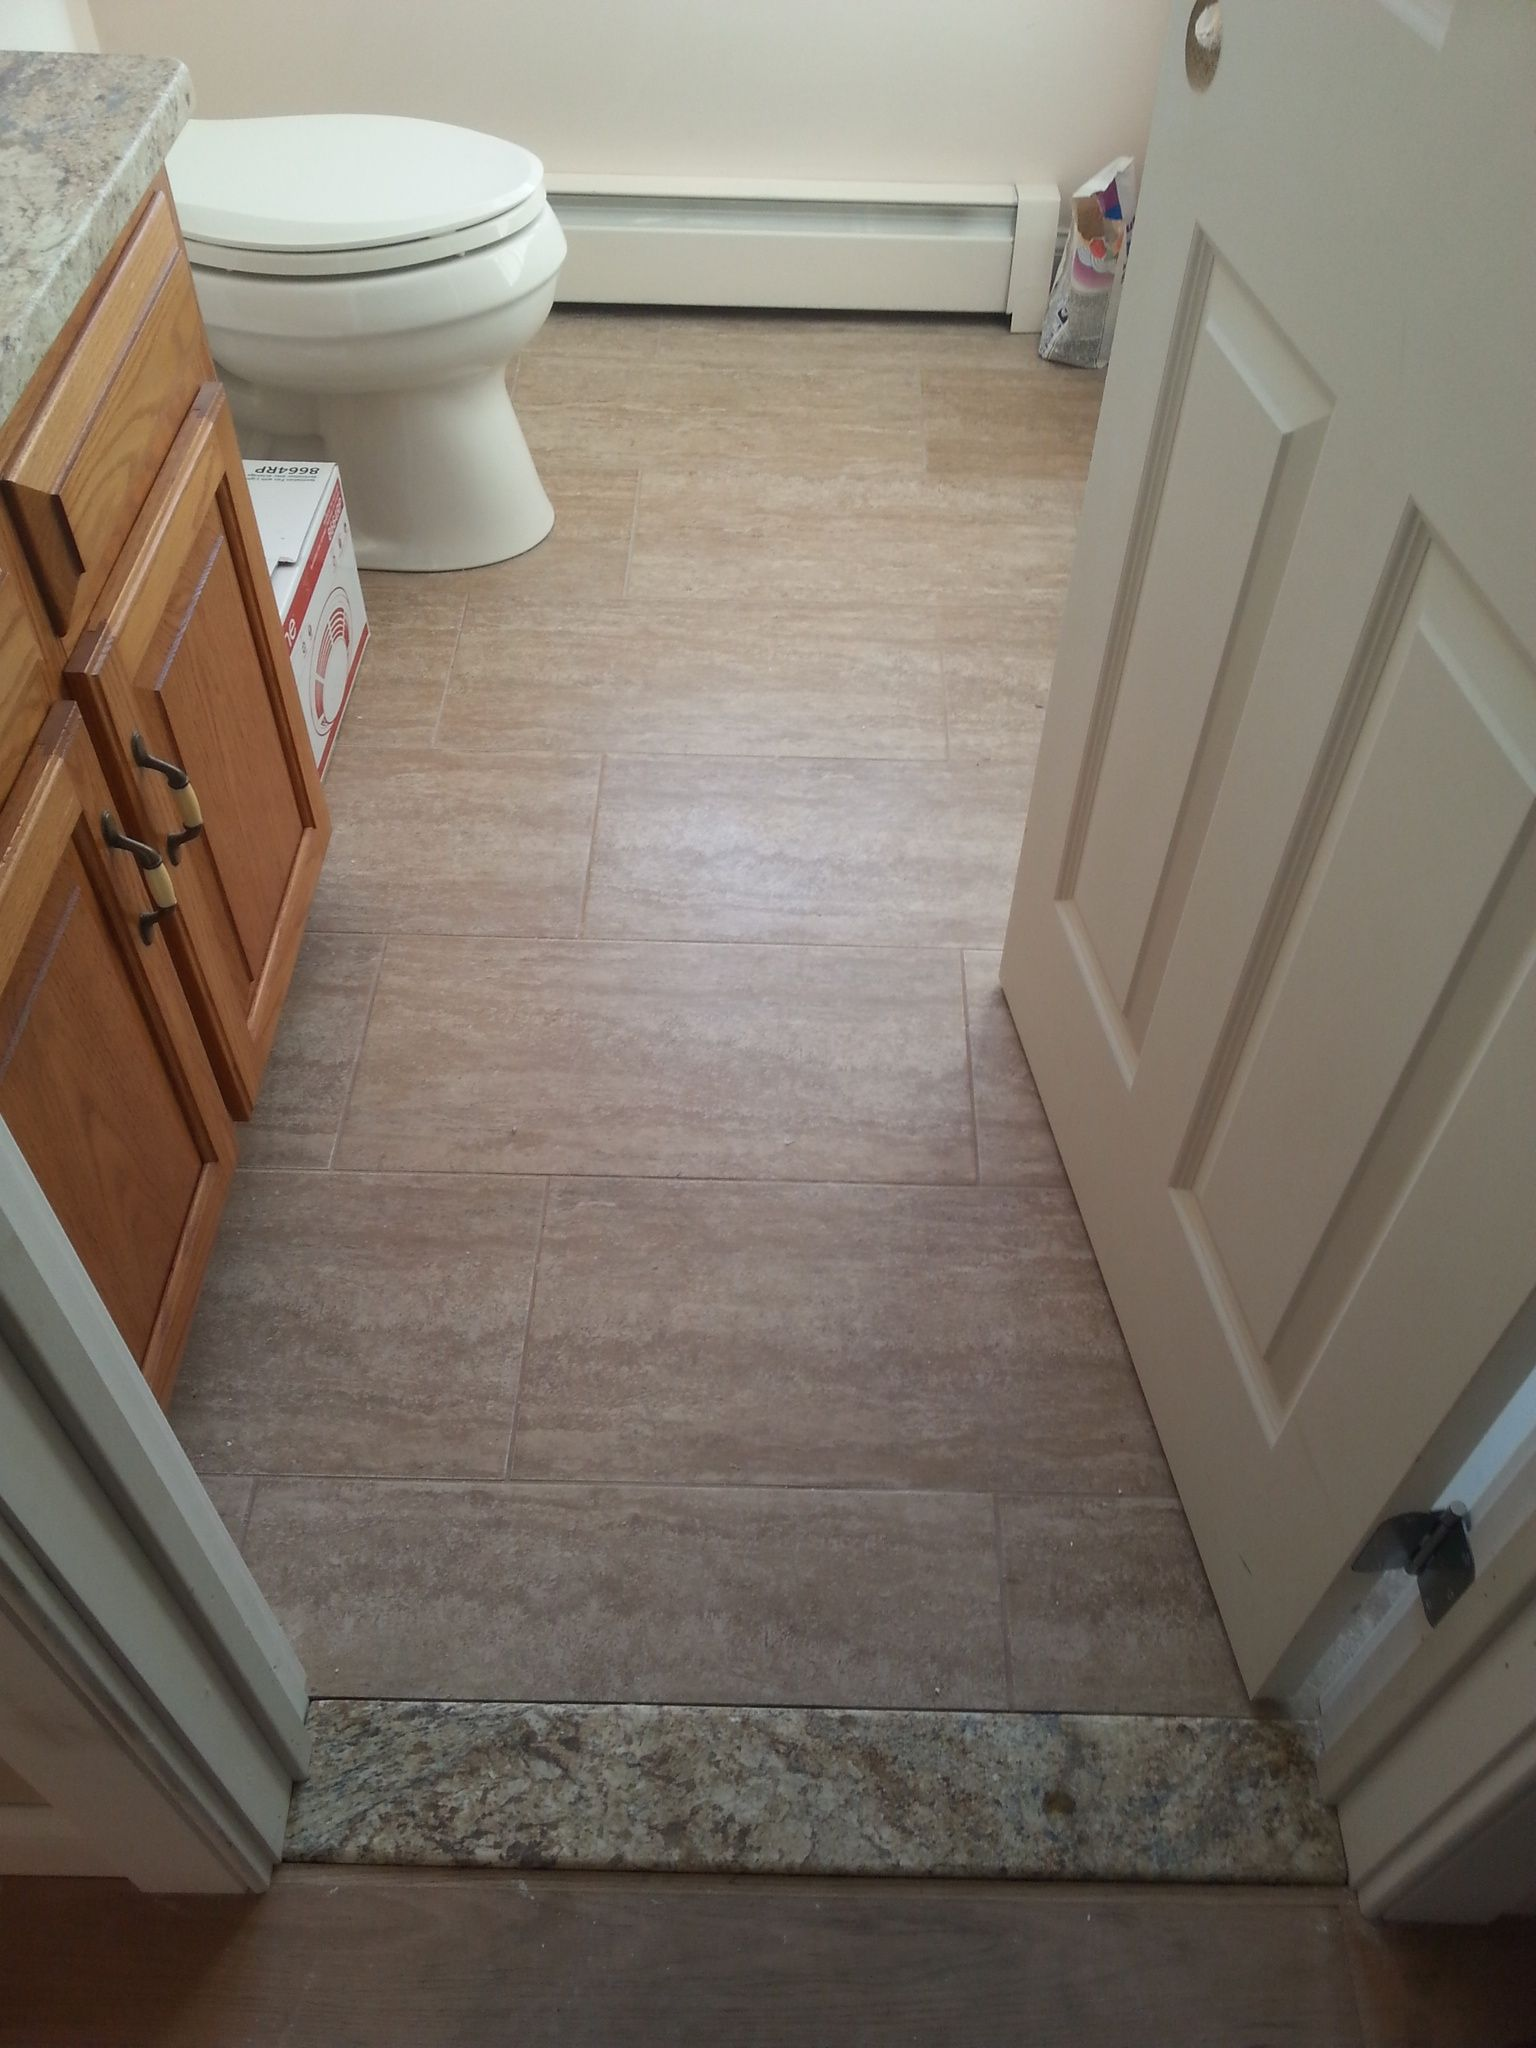 12x24 Tile Installed With Custom Granite Threshold In Doorway Custom Granite Tile Installation 12x24 Tile